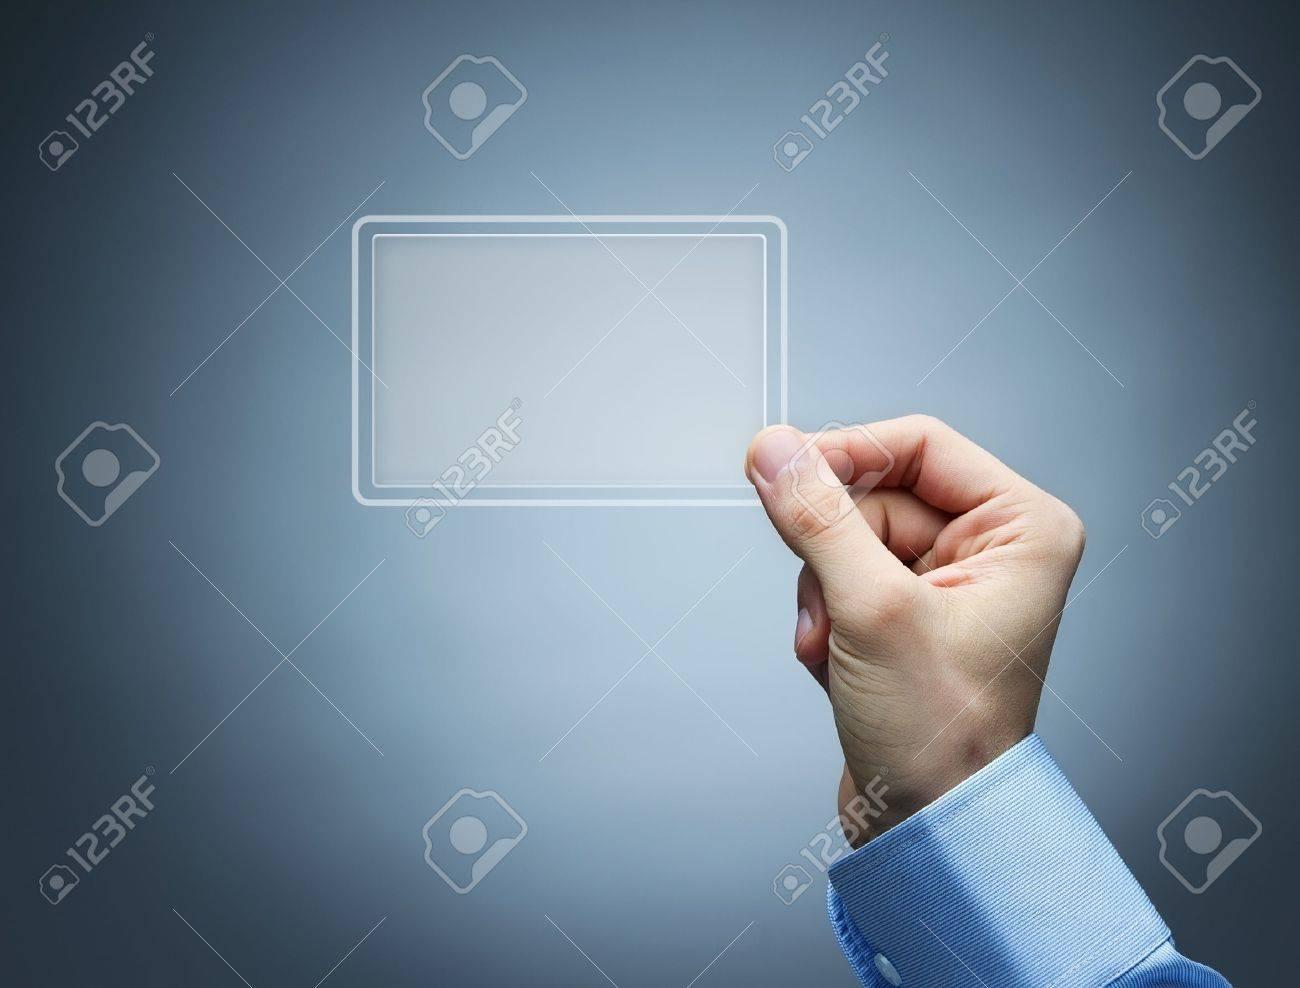 Human Hand Holding Virtual, Transparent Business Card Stock Photo ...